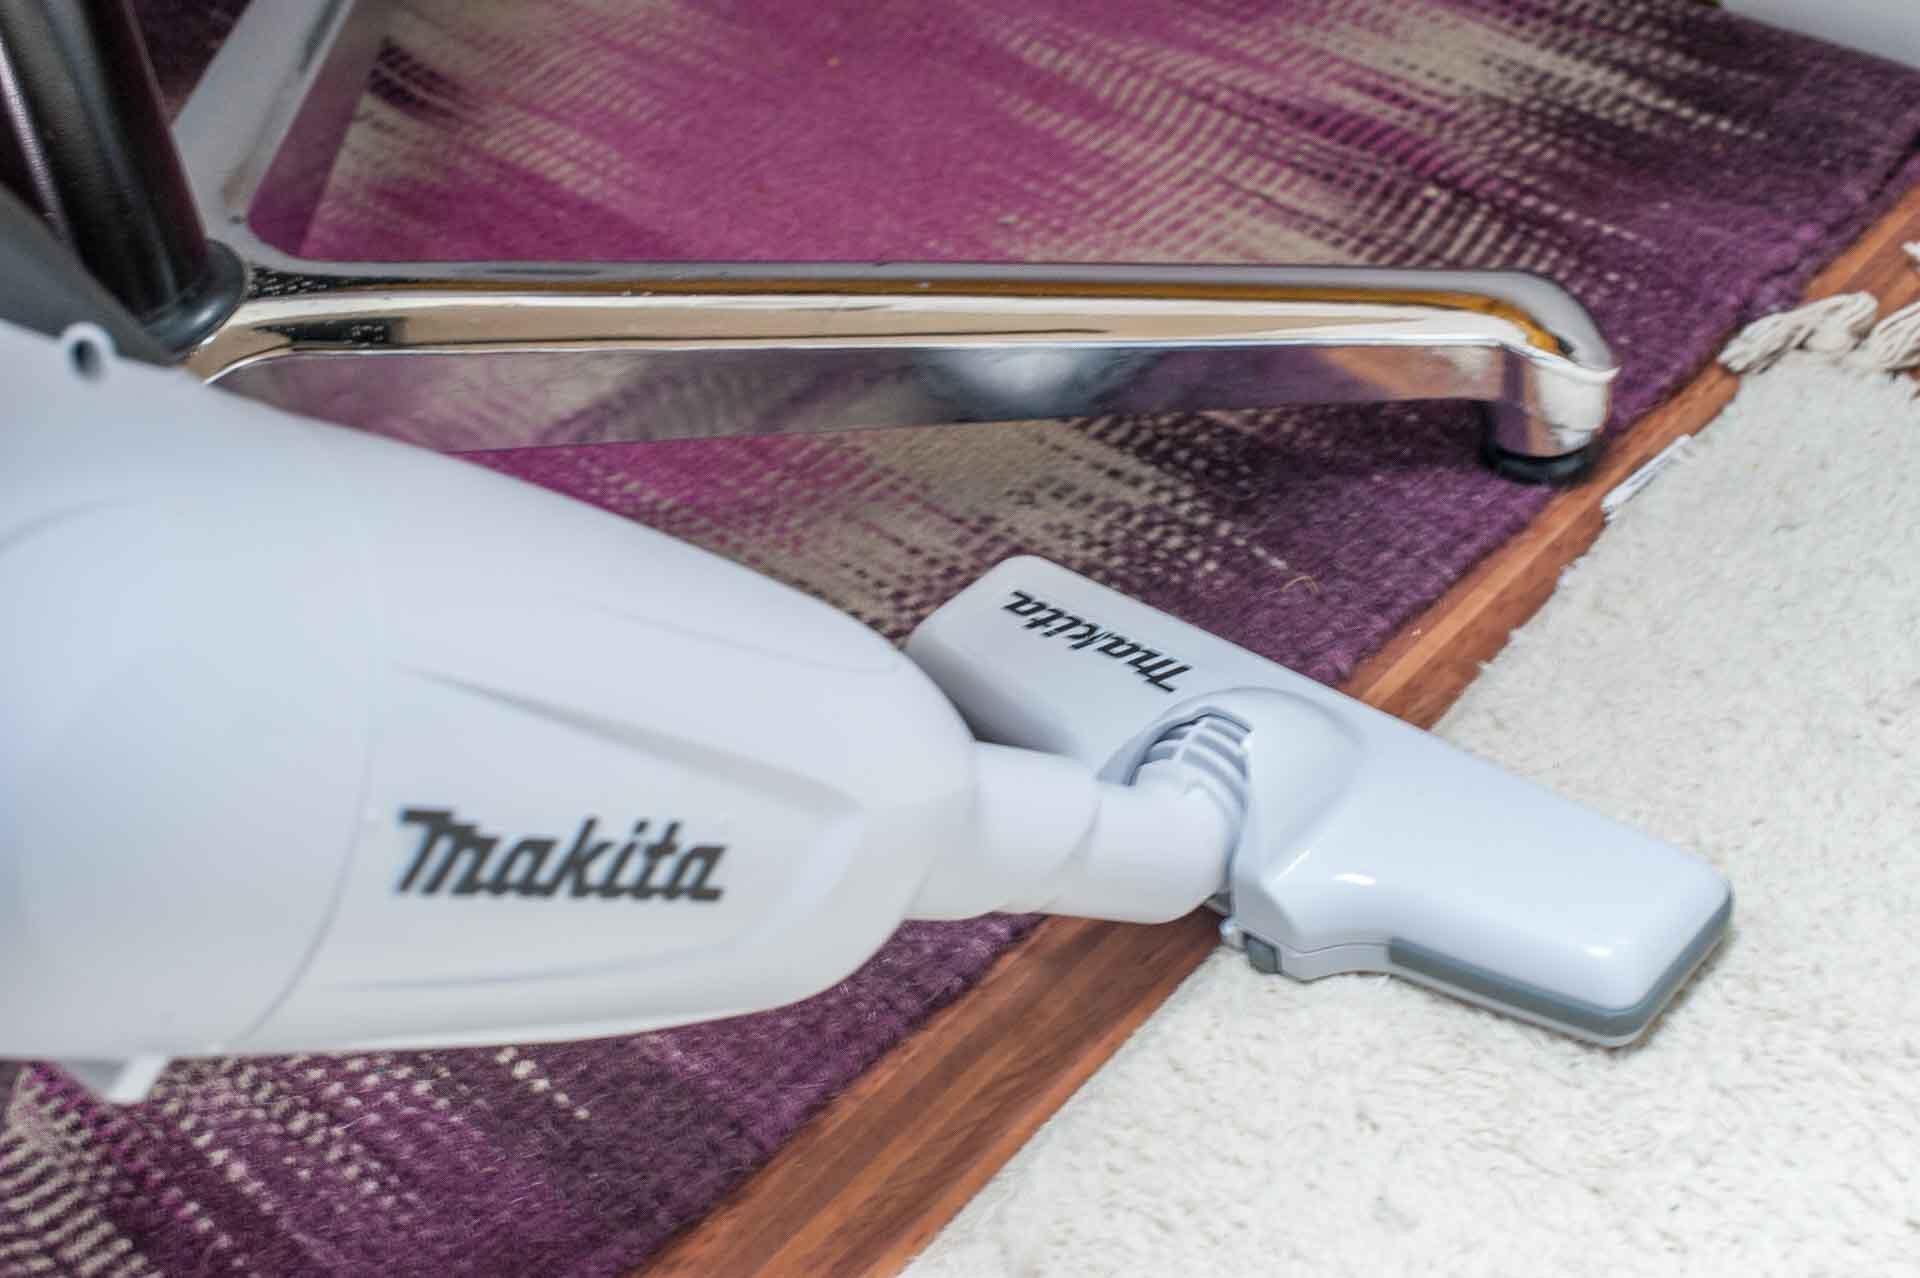 mysmallhouse.de Quick Tipps Akku Staubsauger Makita 18v weiss wohnwagen saugen putzen reinigen